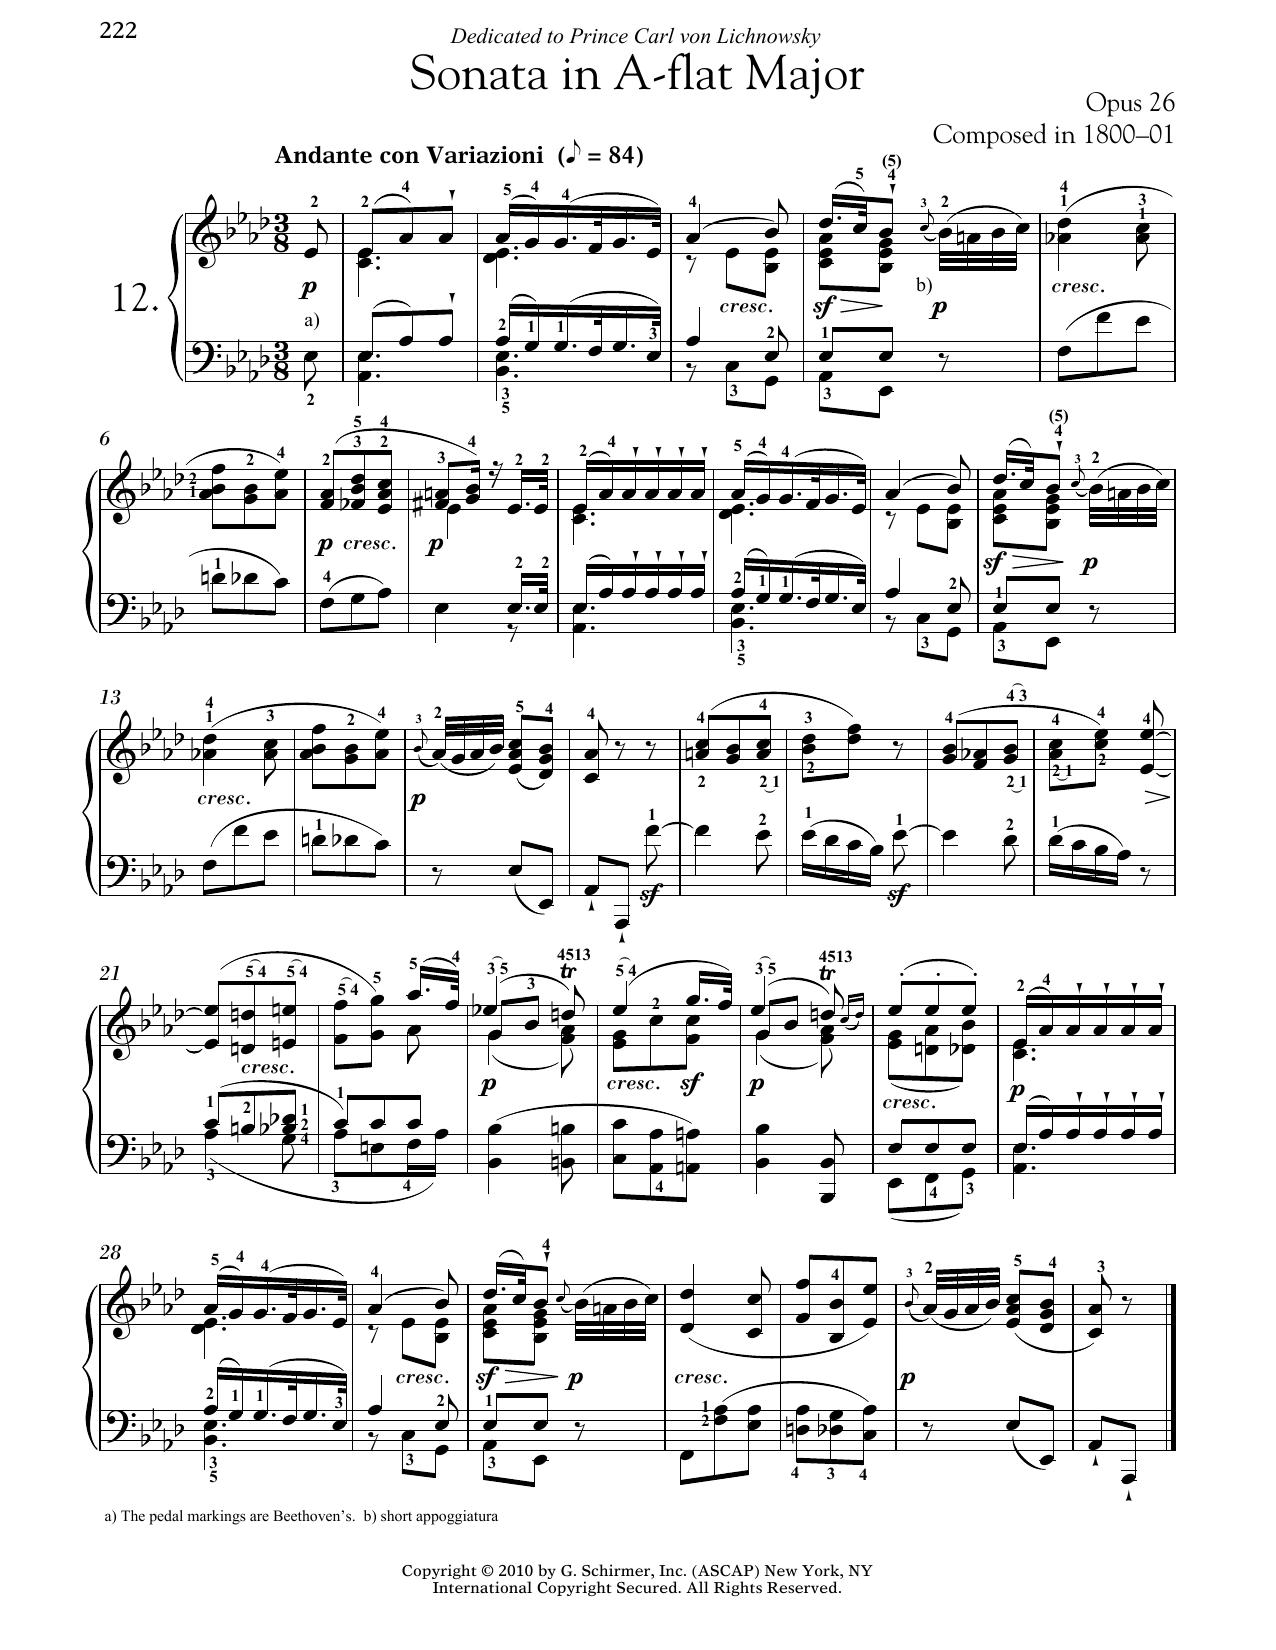 Piano Sonata No. 12 In A-flat Major, Op. 26 (Piano Solo)